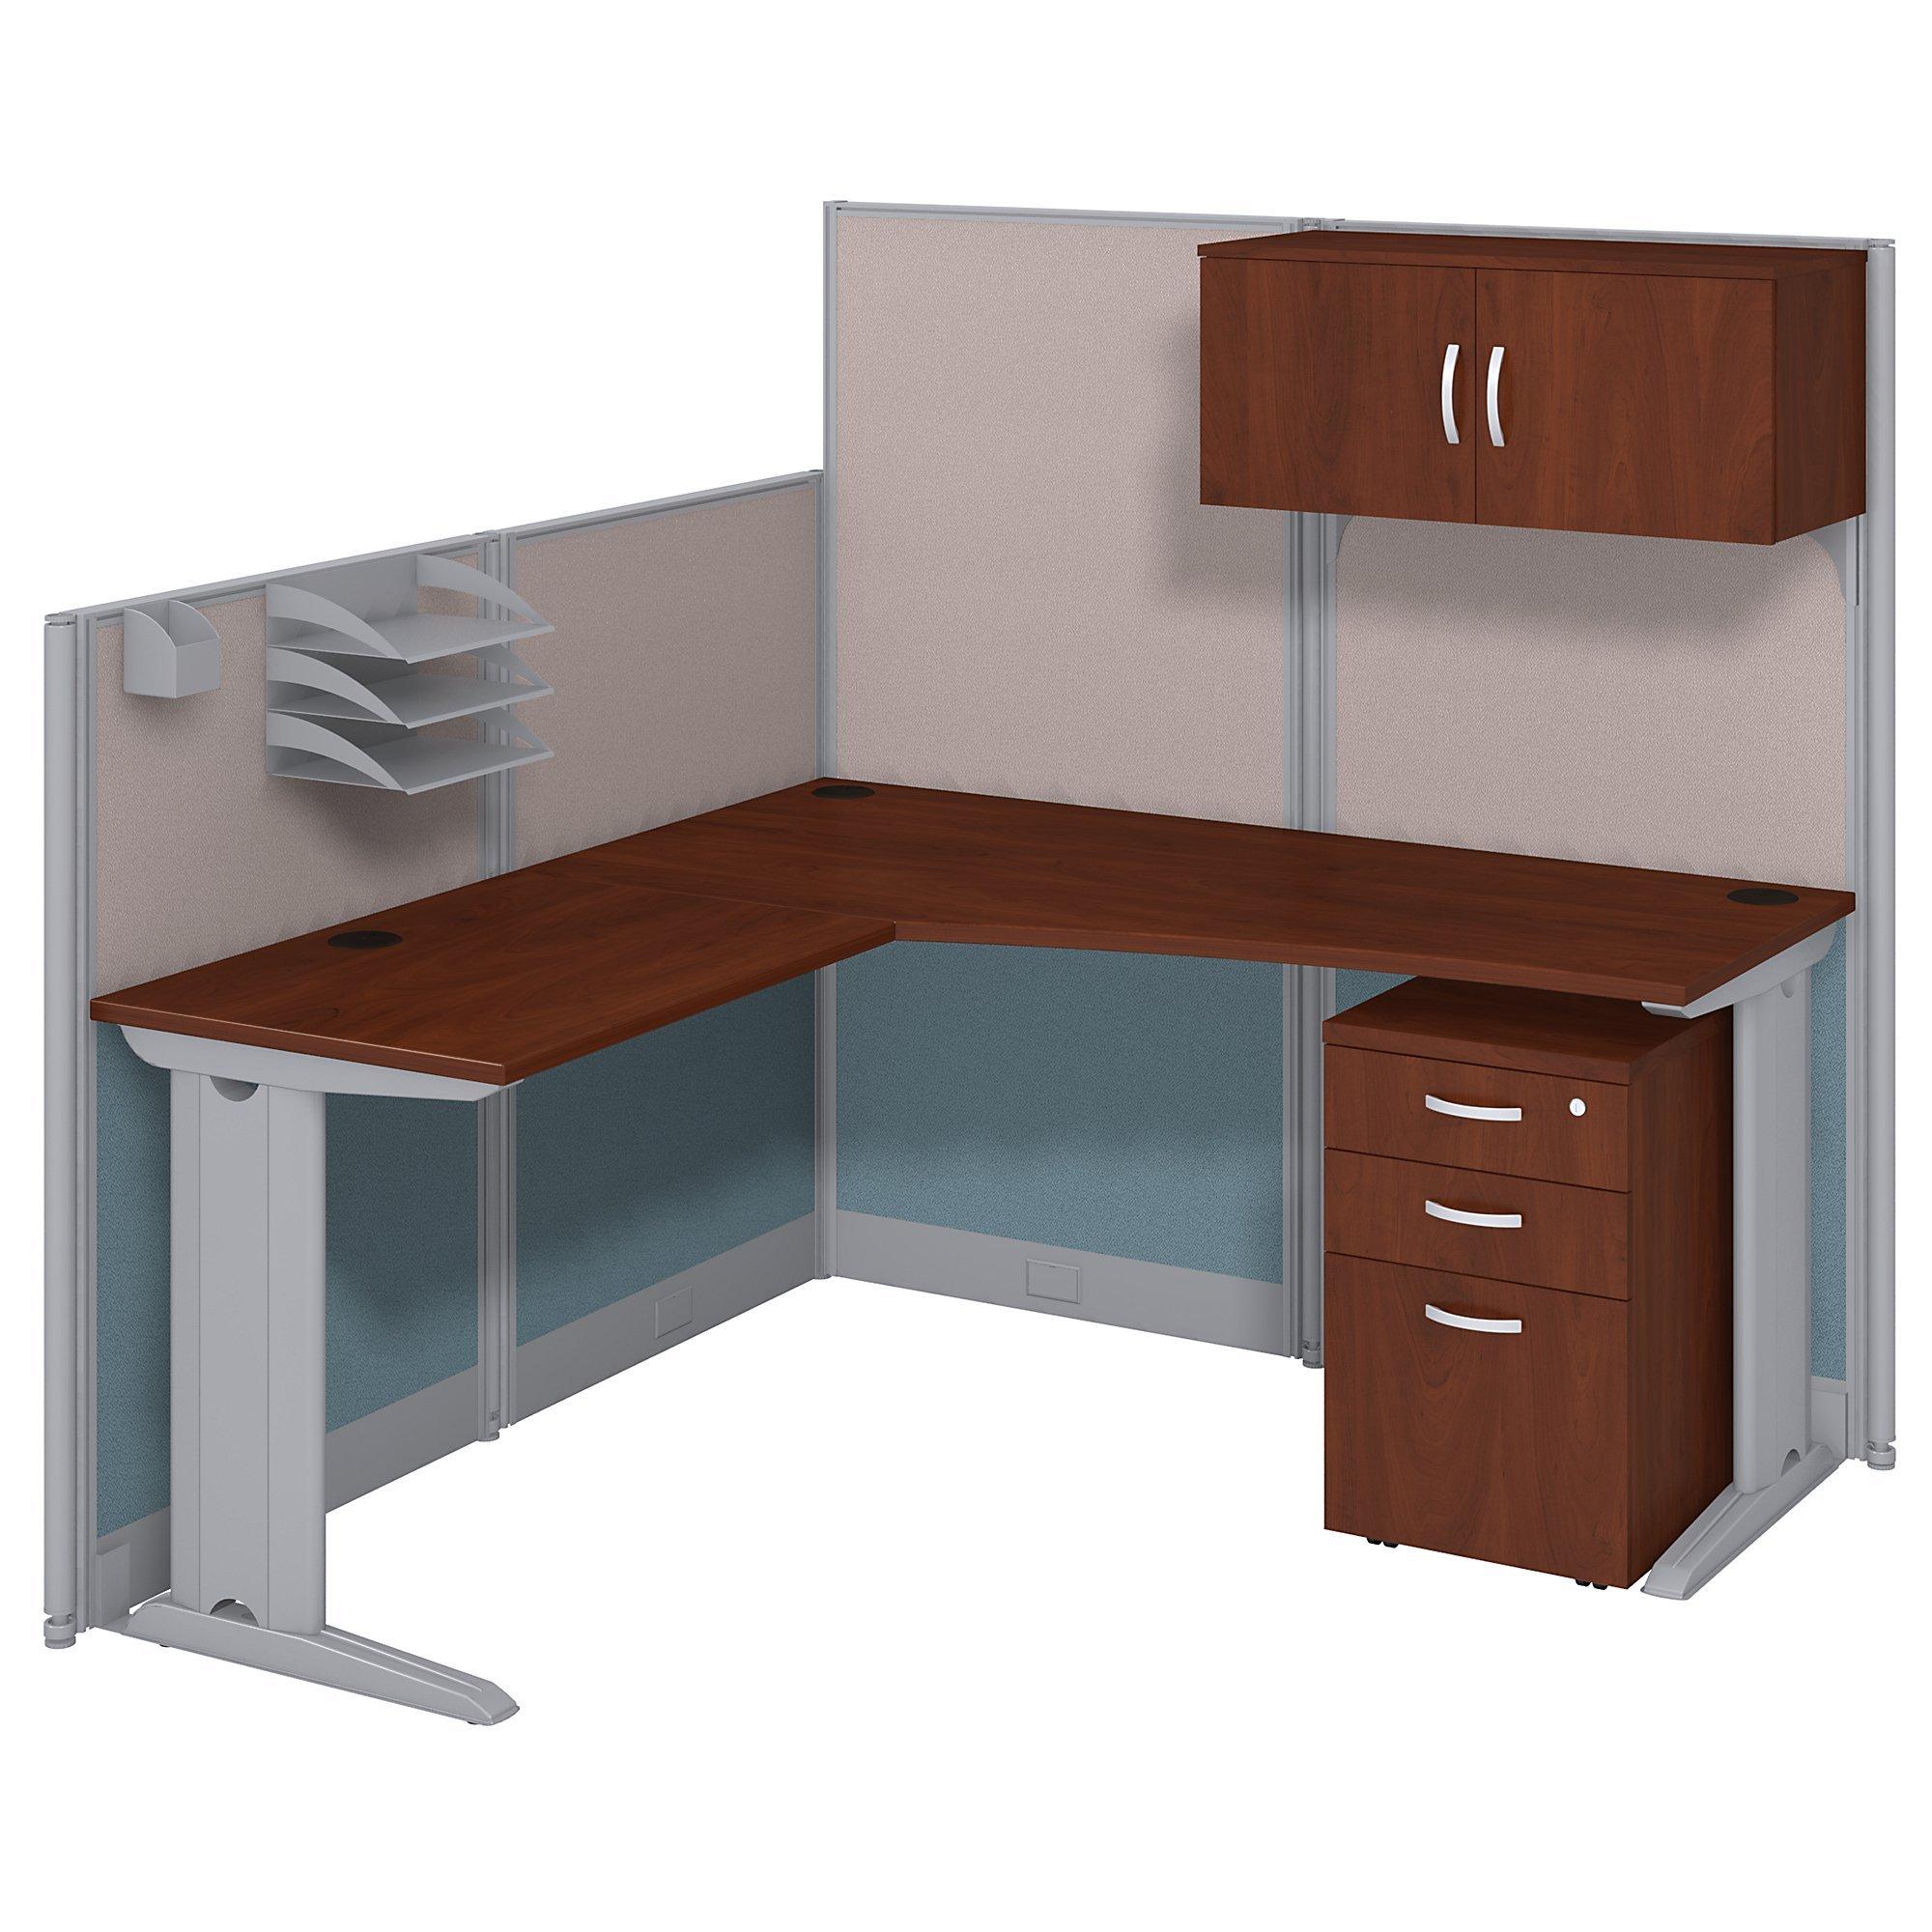 Bush Business Furniture WC36494-03STGK L-Workstation and Storage Kit, 65'' x 65'', Hansen Cherry by Bush Business Furniture